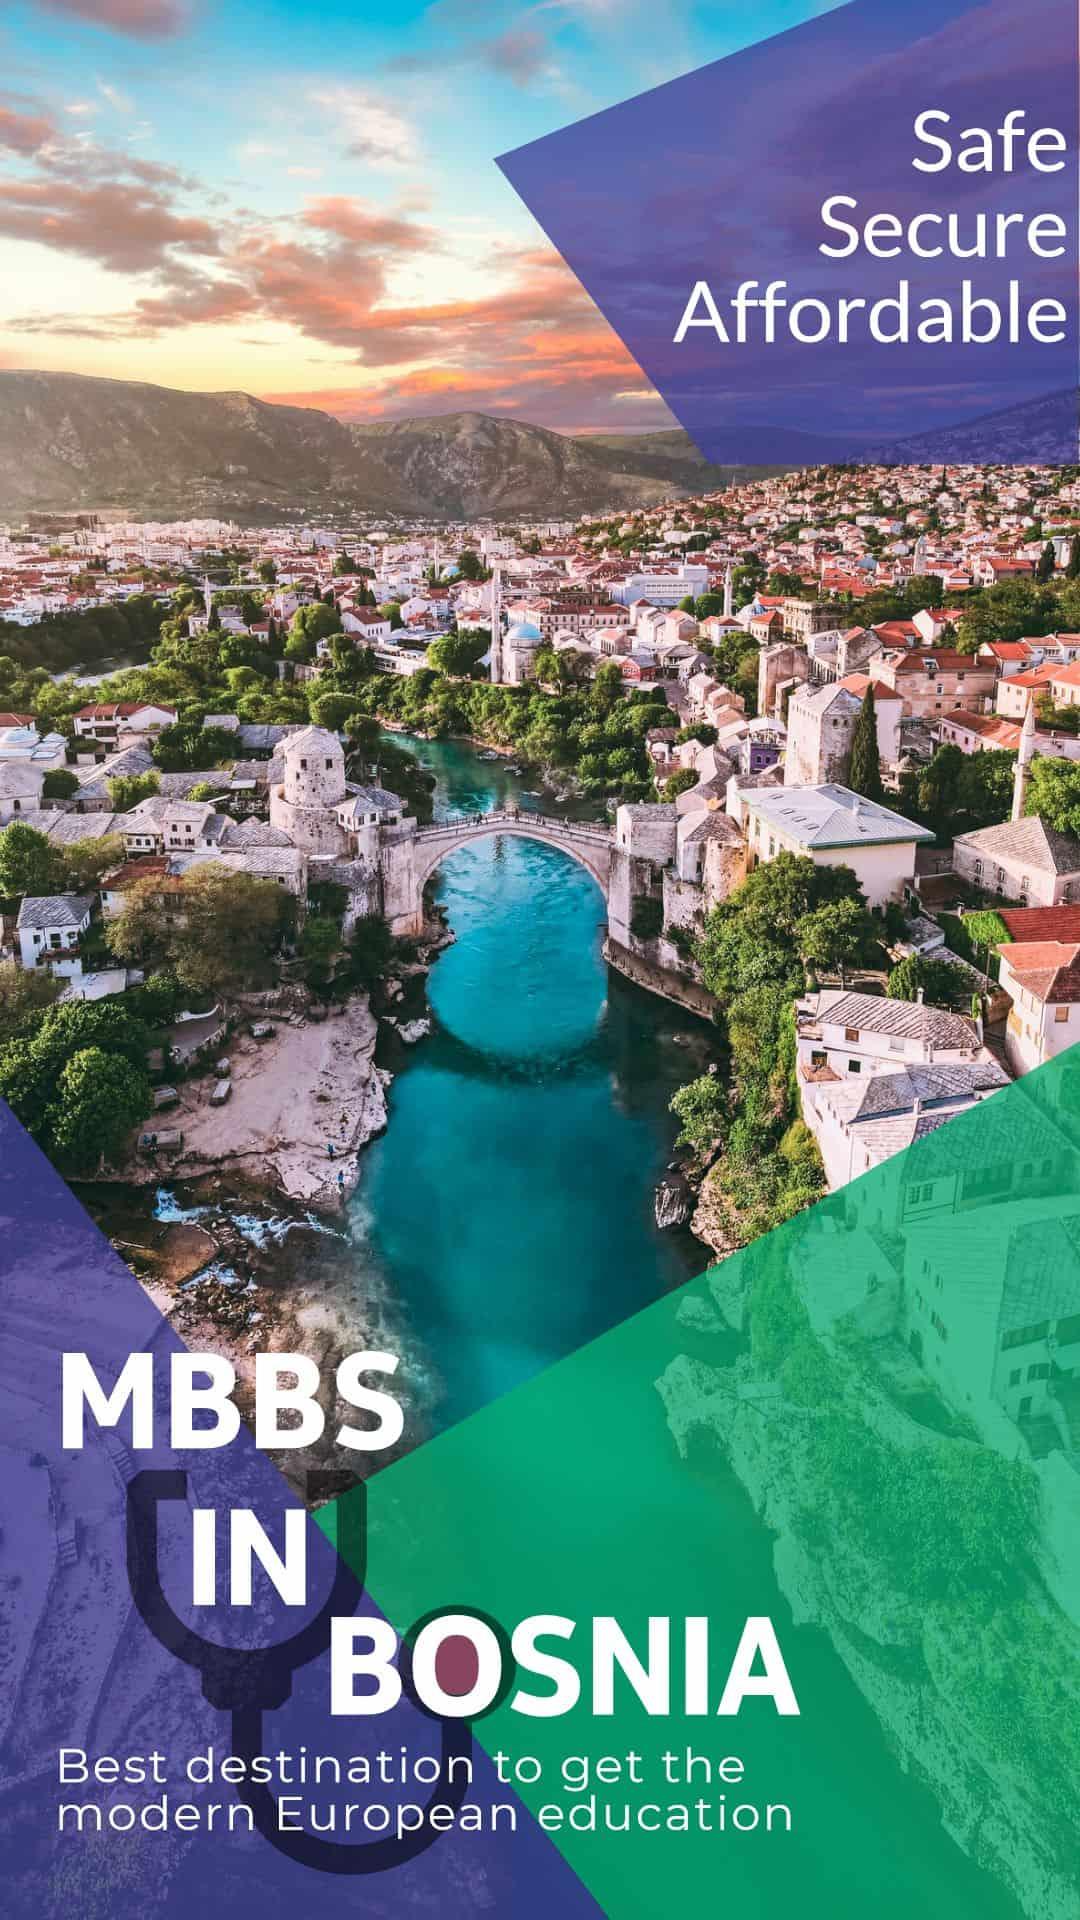 Study MBBS in Georgia for European modern mdedical education